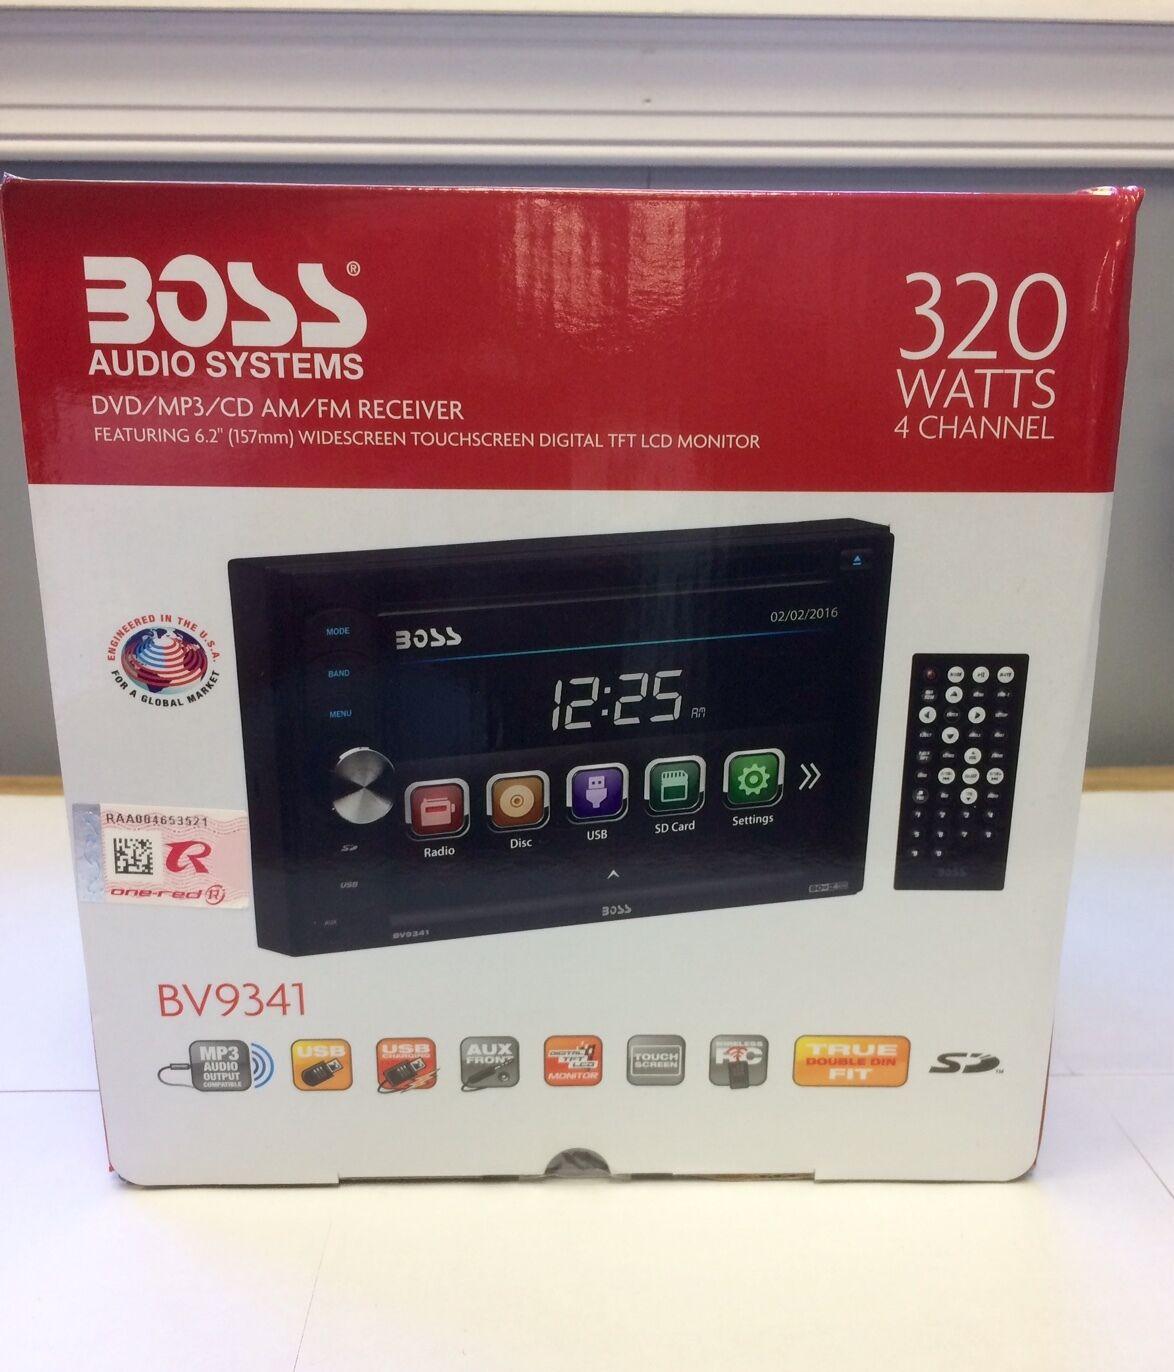 $74.99 - Boss BV9341 Double DIN DVD/CD/AM/FM/Digital Media Car Stereo Receiver NEW